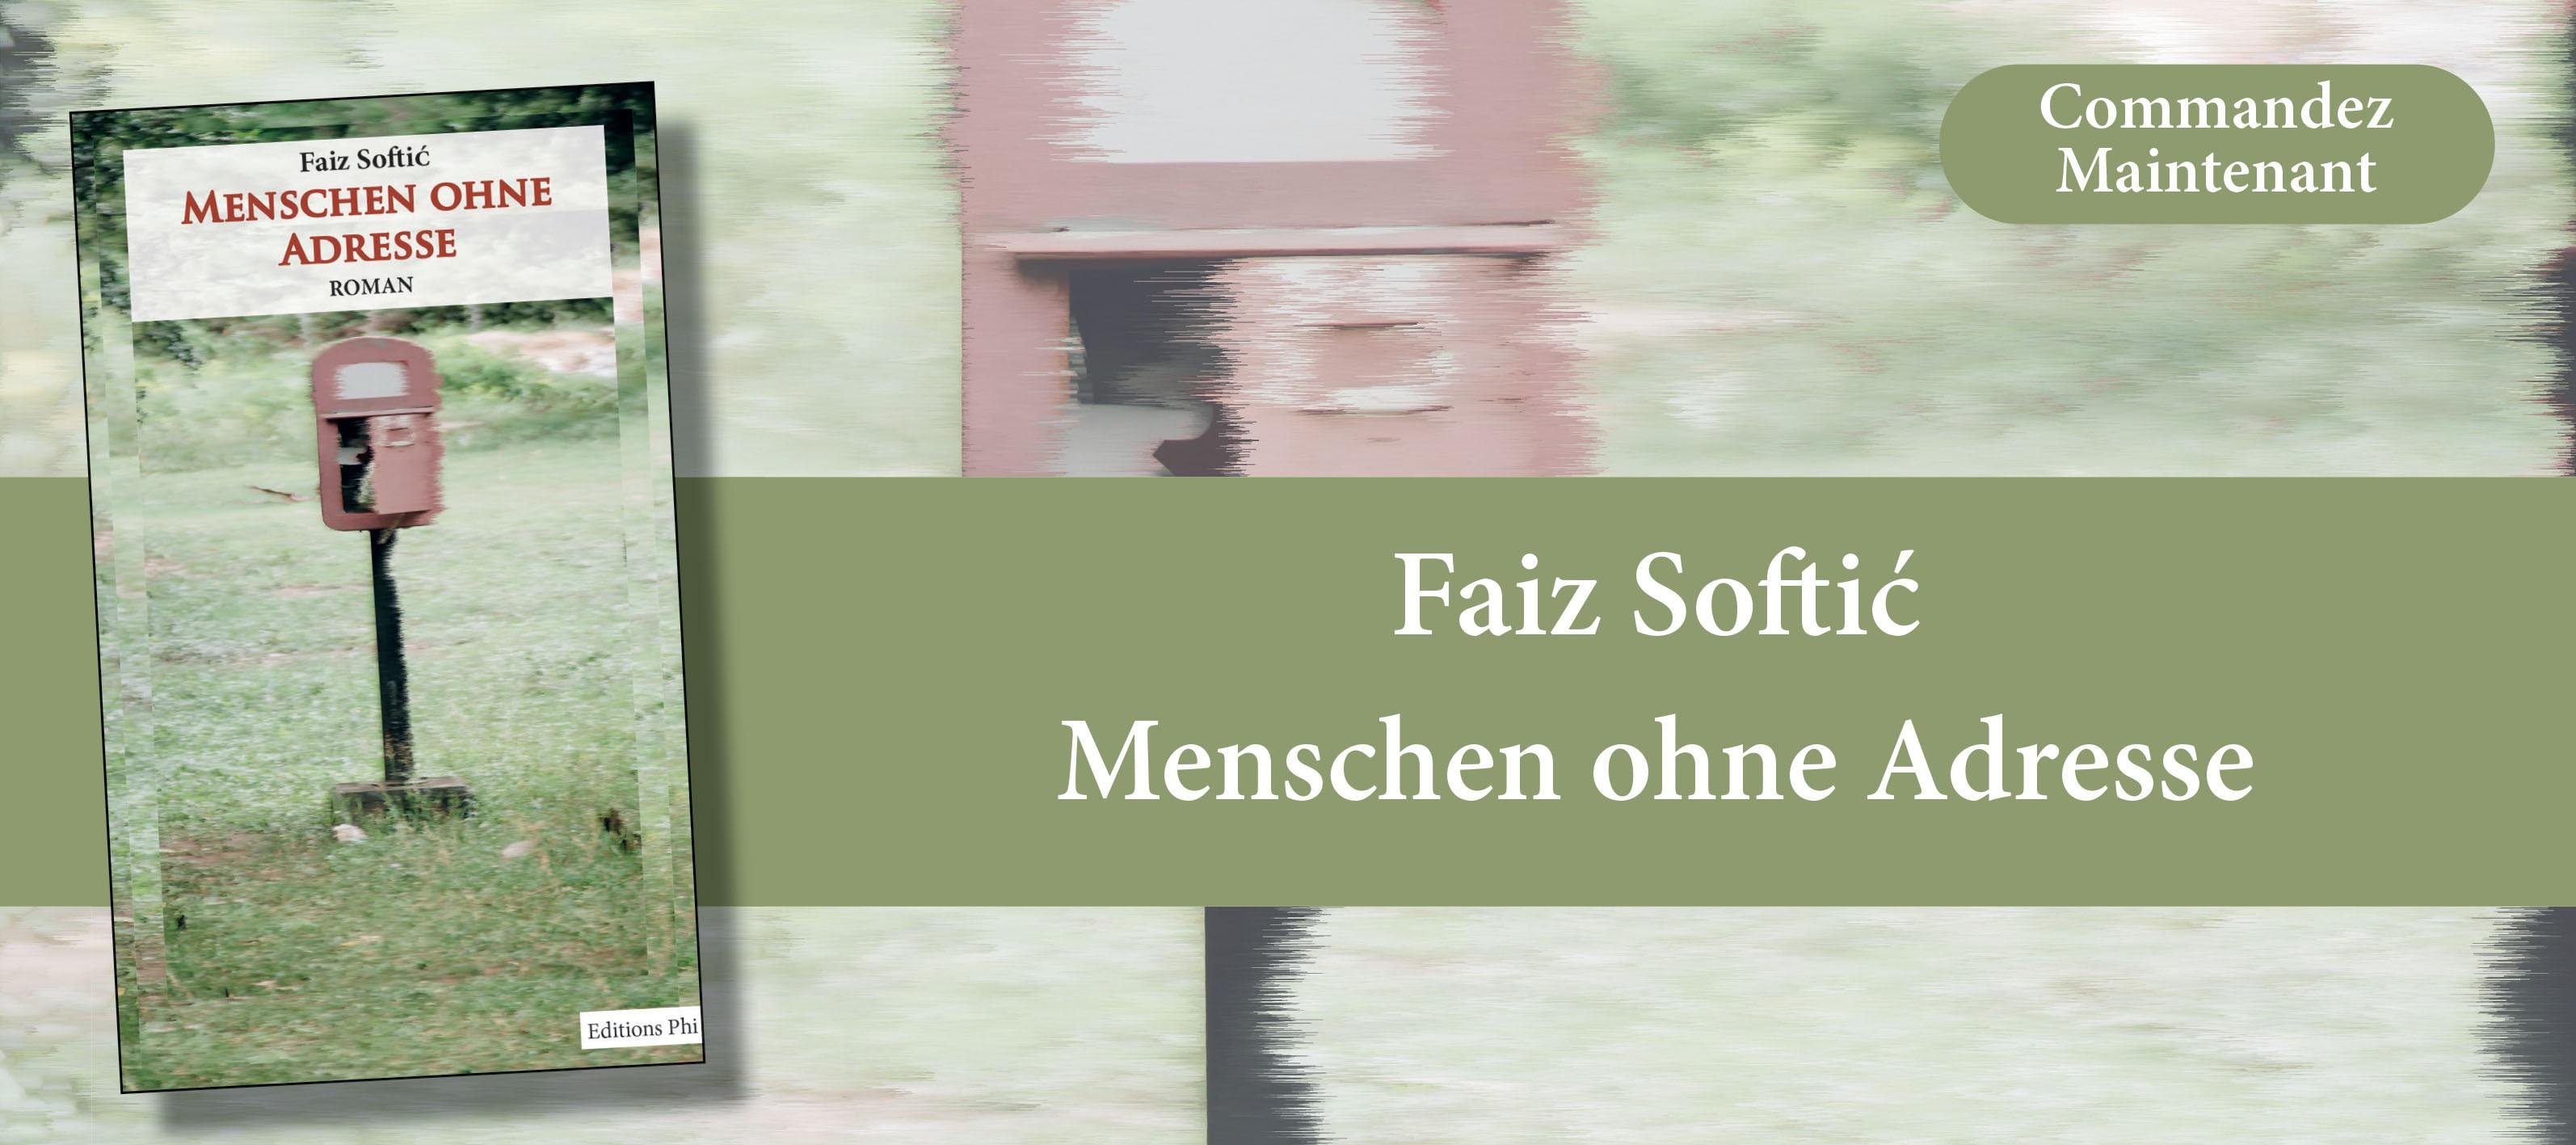 http://www.editionsphi.lu/fr/home/476-faiz-softic-menschen-ohne-adresse.html